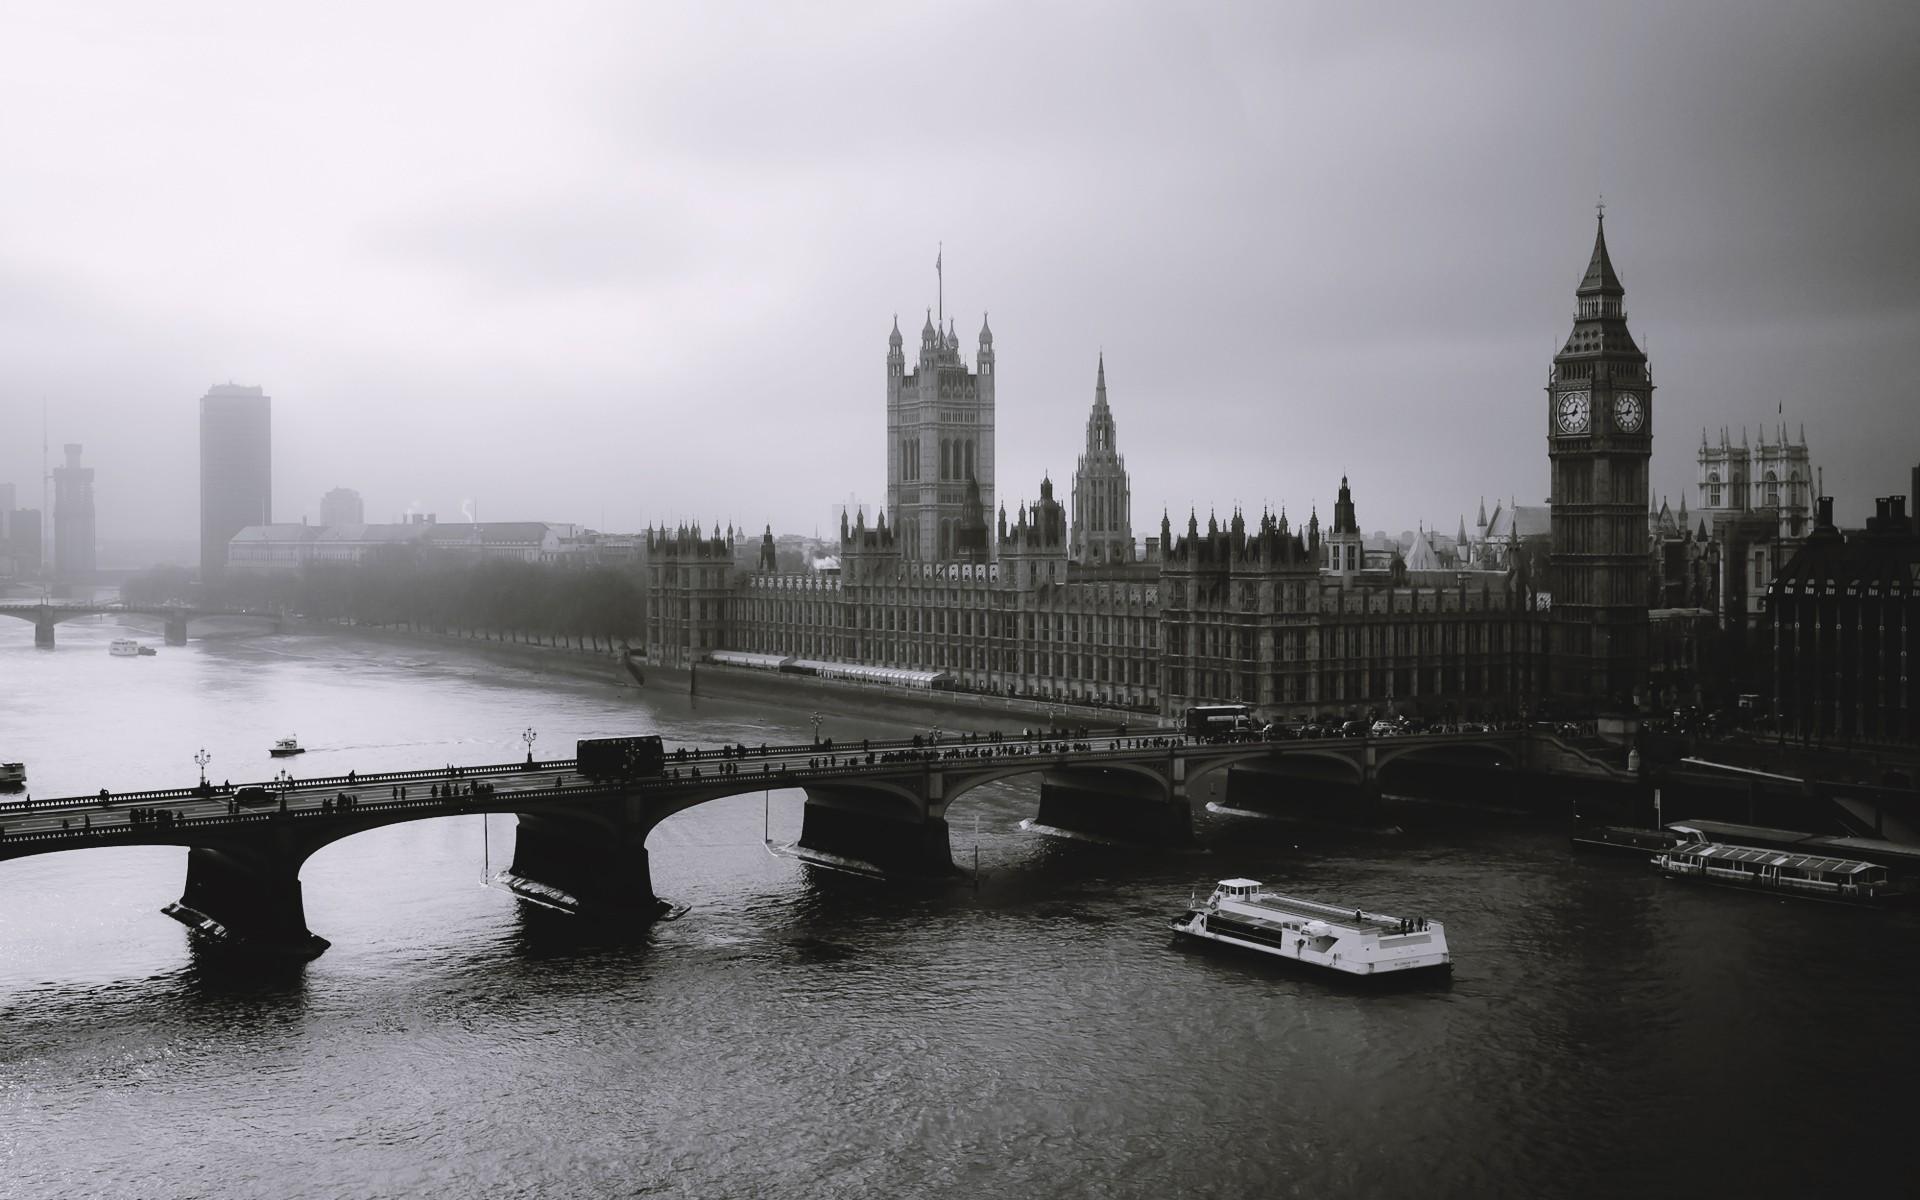 Cityscapes London Wallpaper 1920x1200 Cityscapes London Black White 1920x1200